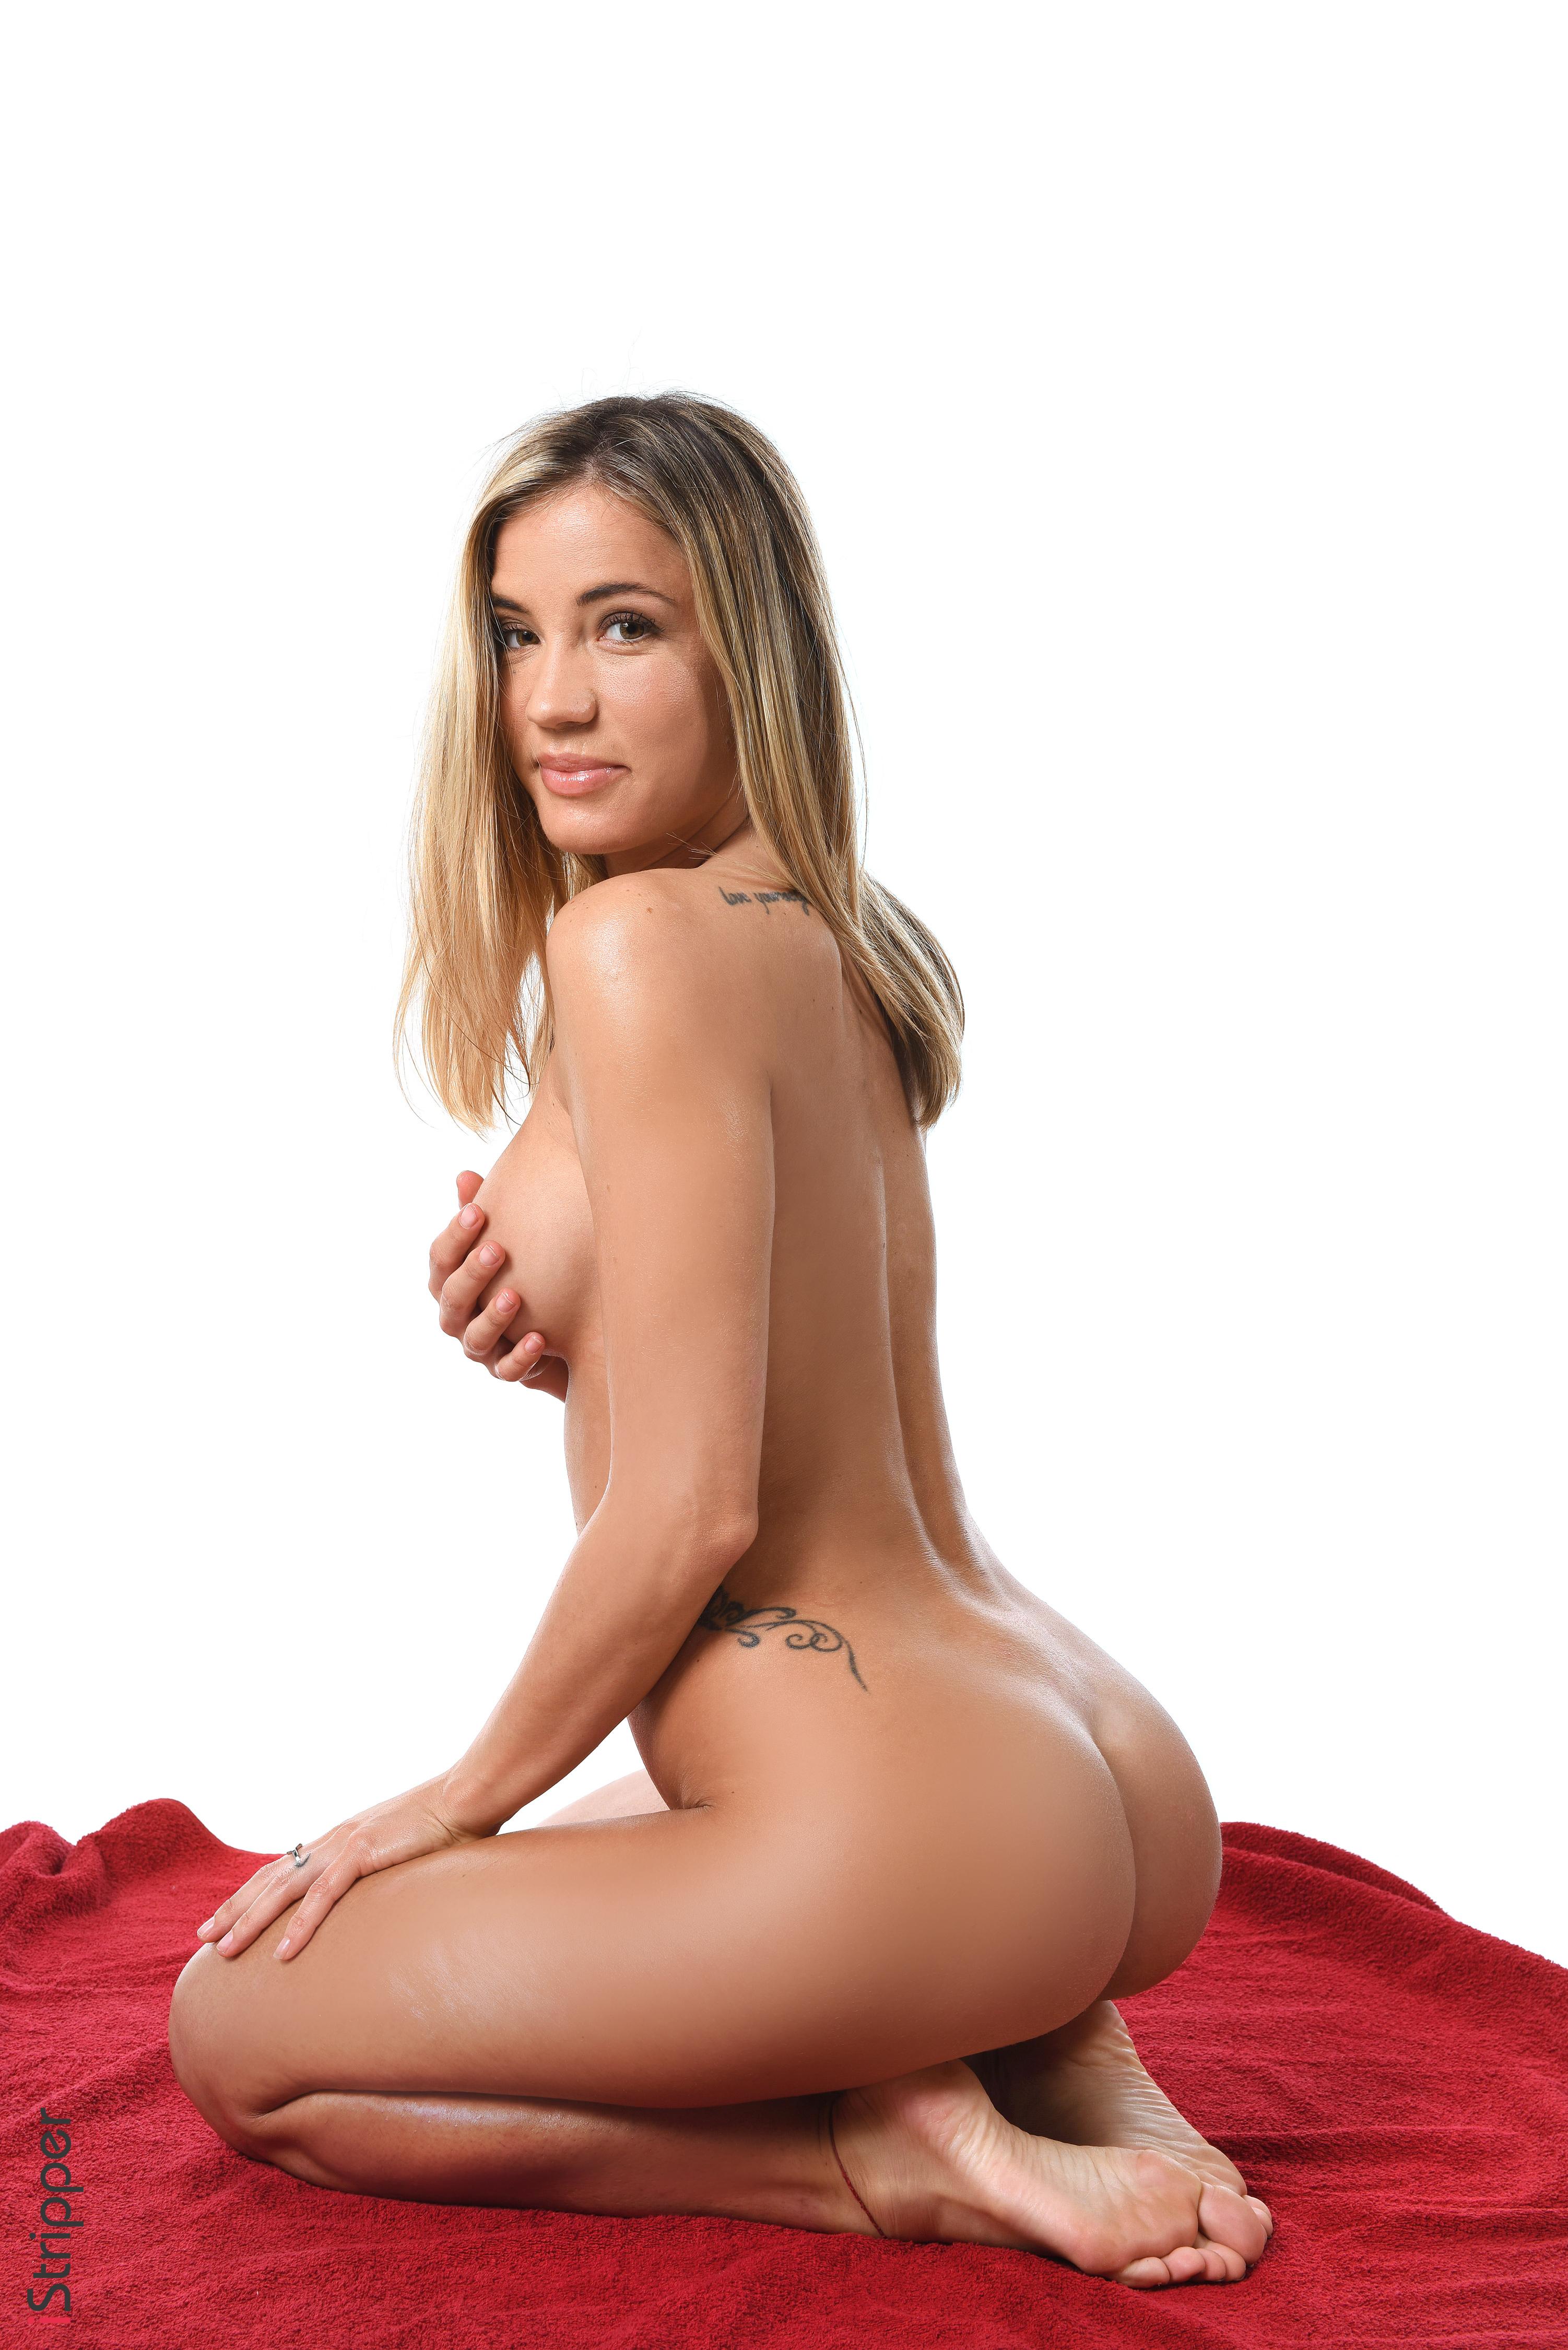 nude womens wallpaper